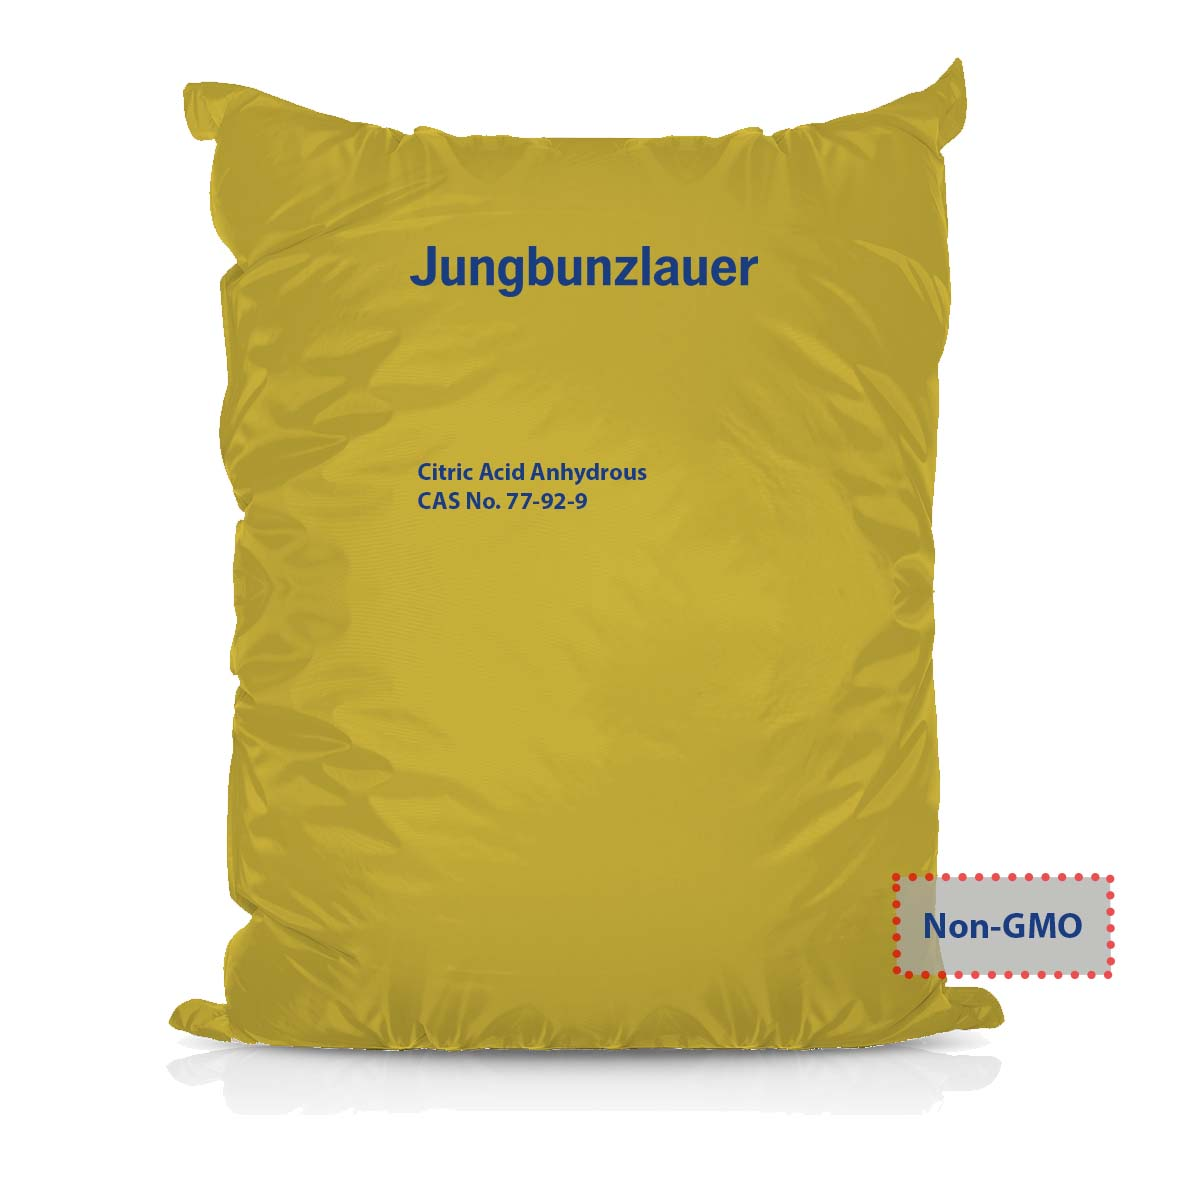 Citric Acid Anhydrous Fine F6000 Non-GMO Bag